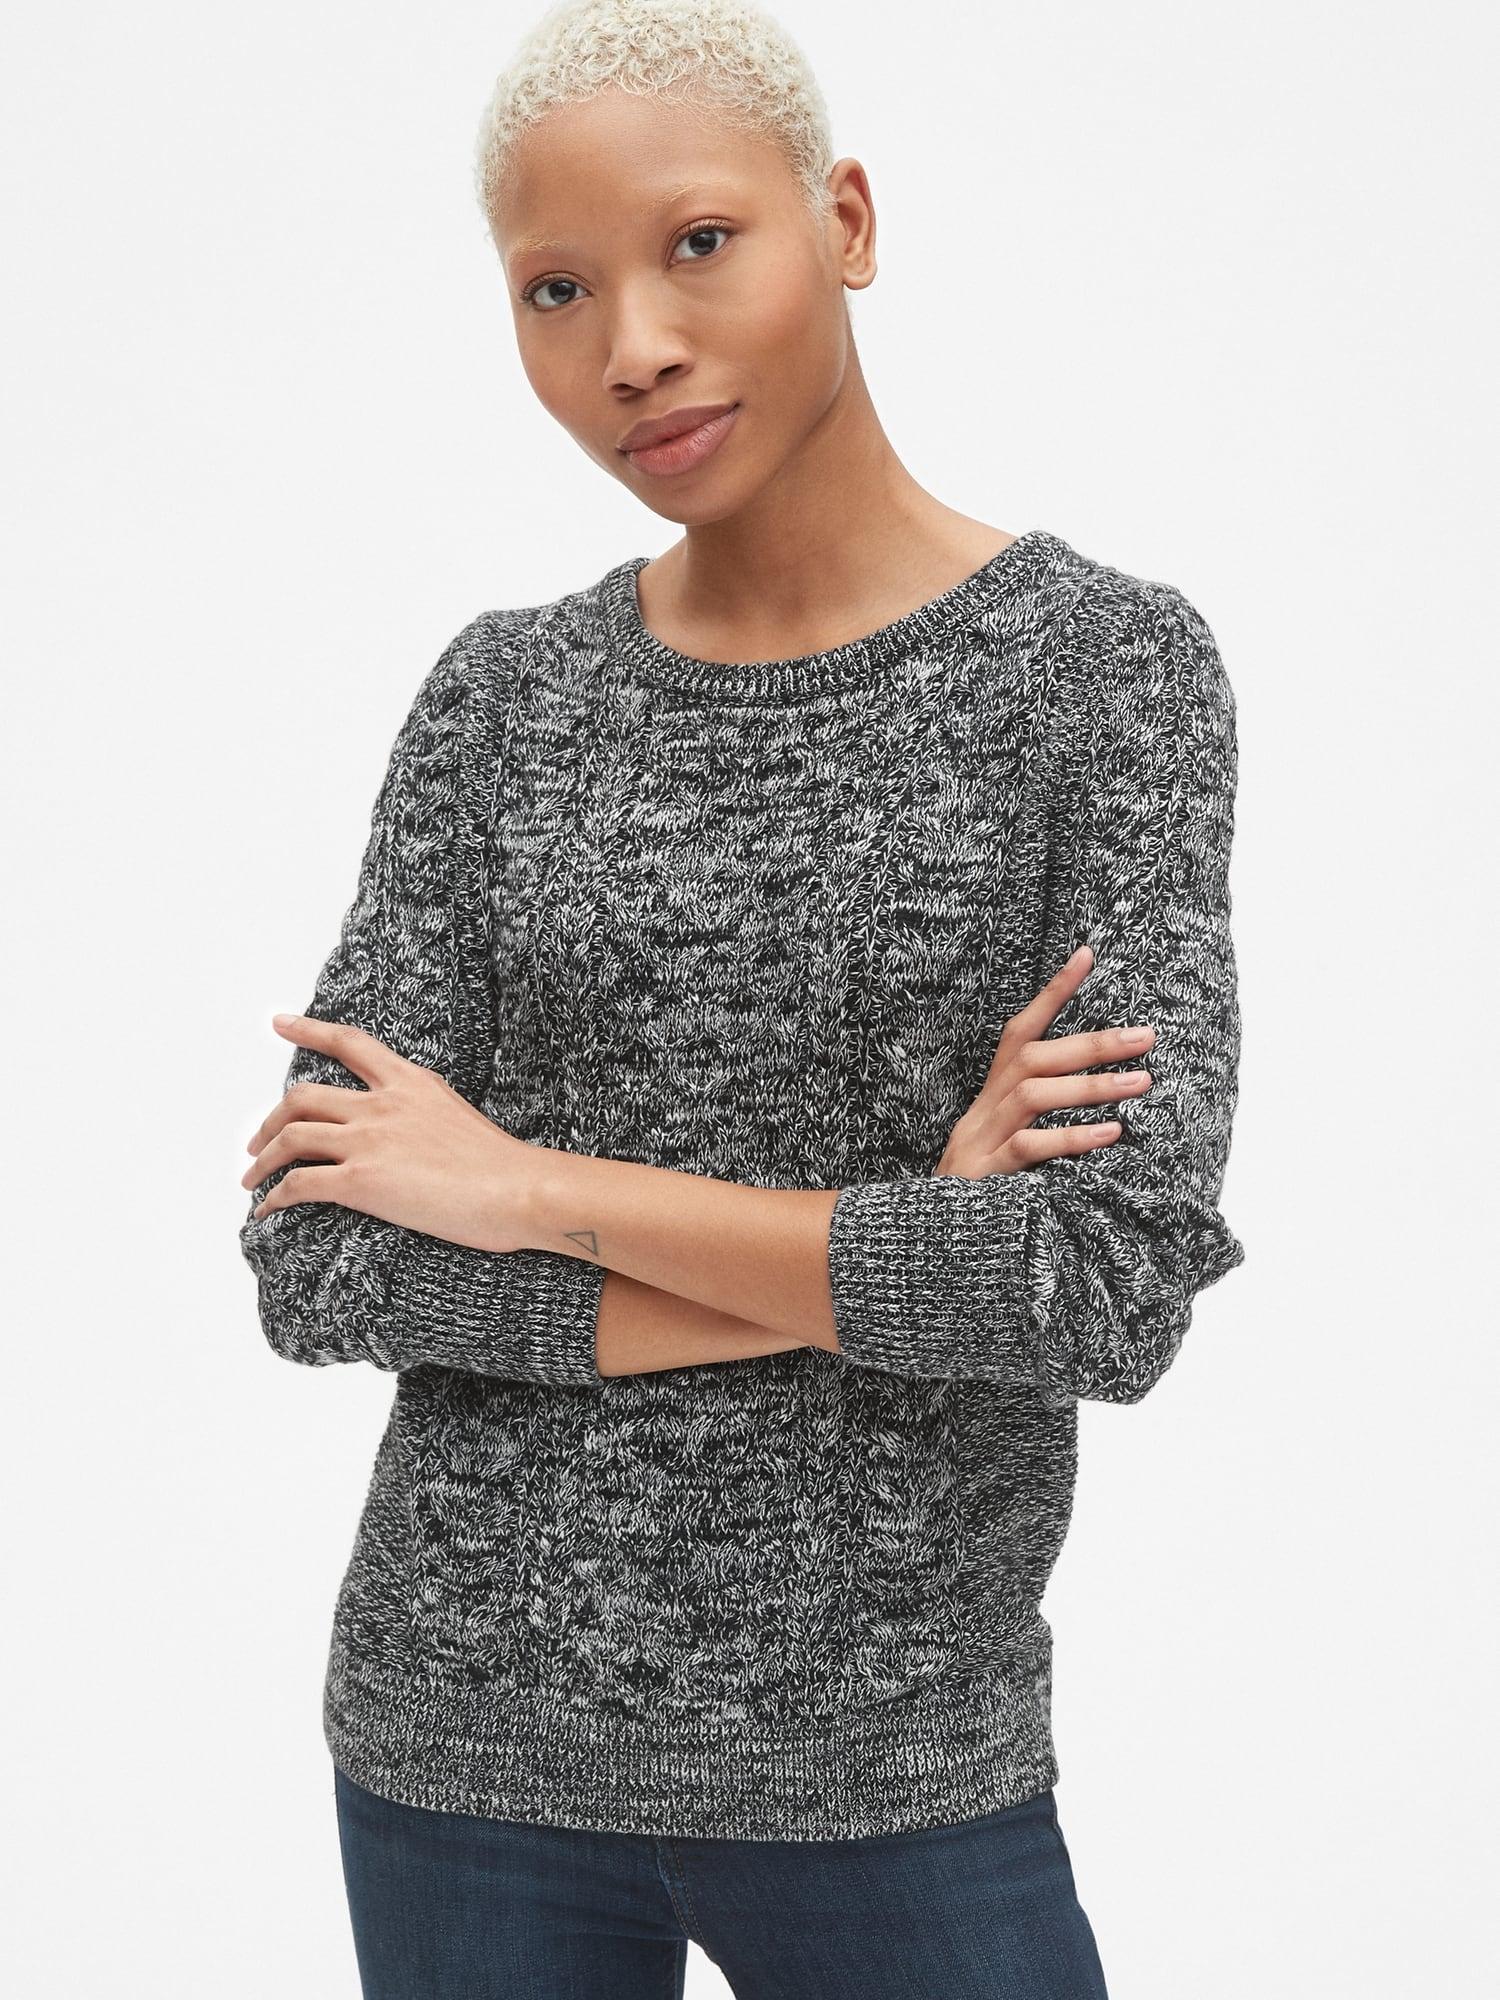 de70d8cd5 Lyst - Gap Cable-knit Crewneck Pullover Sweater in Black